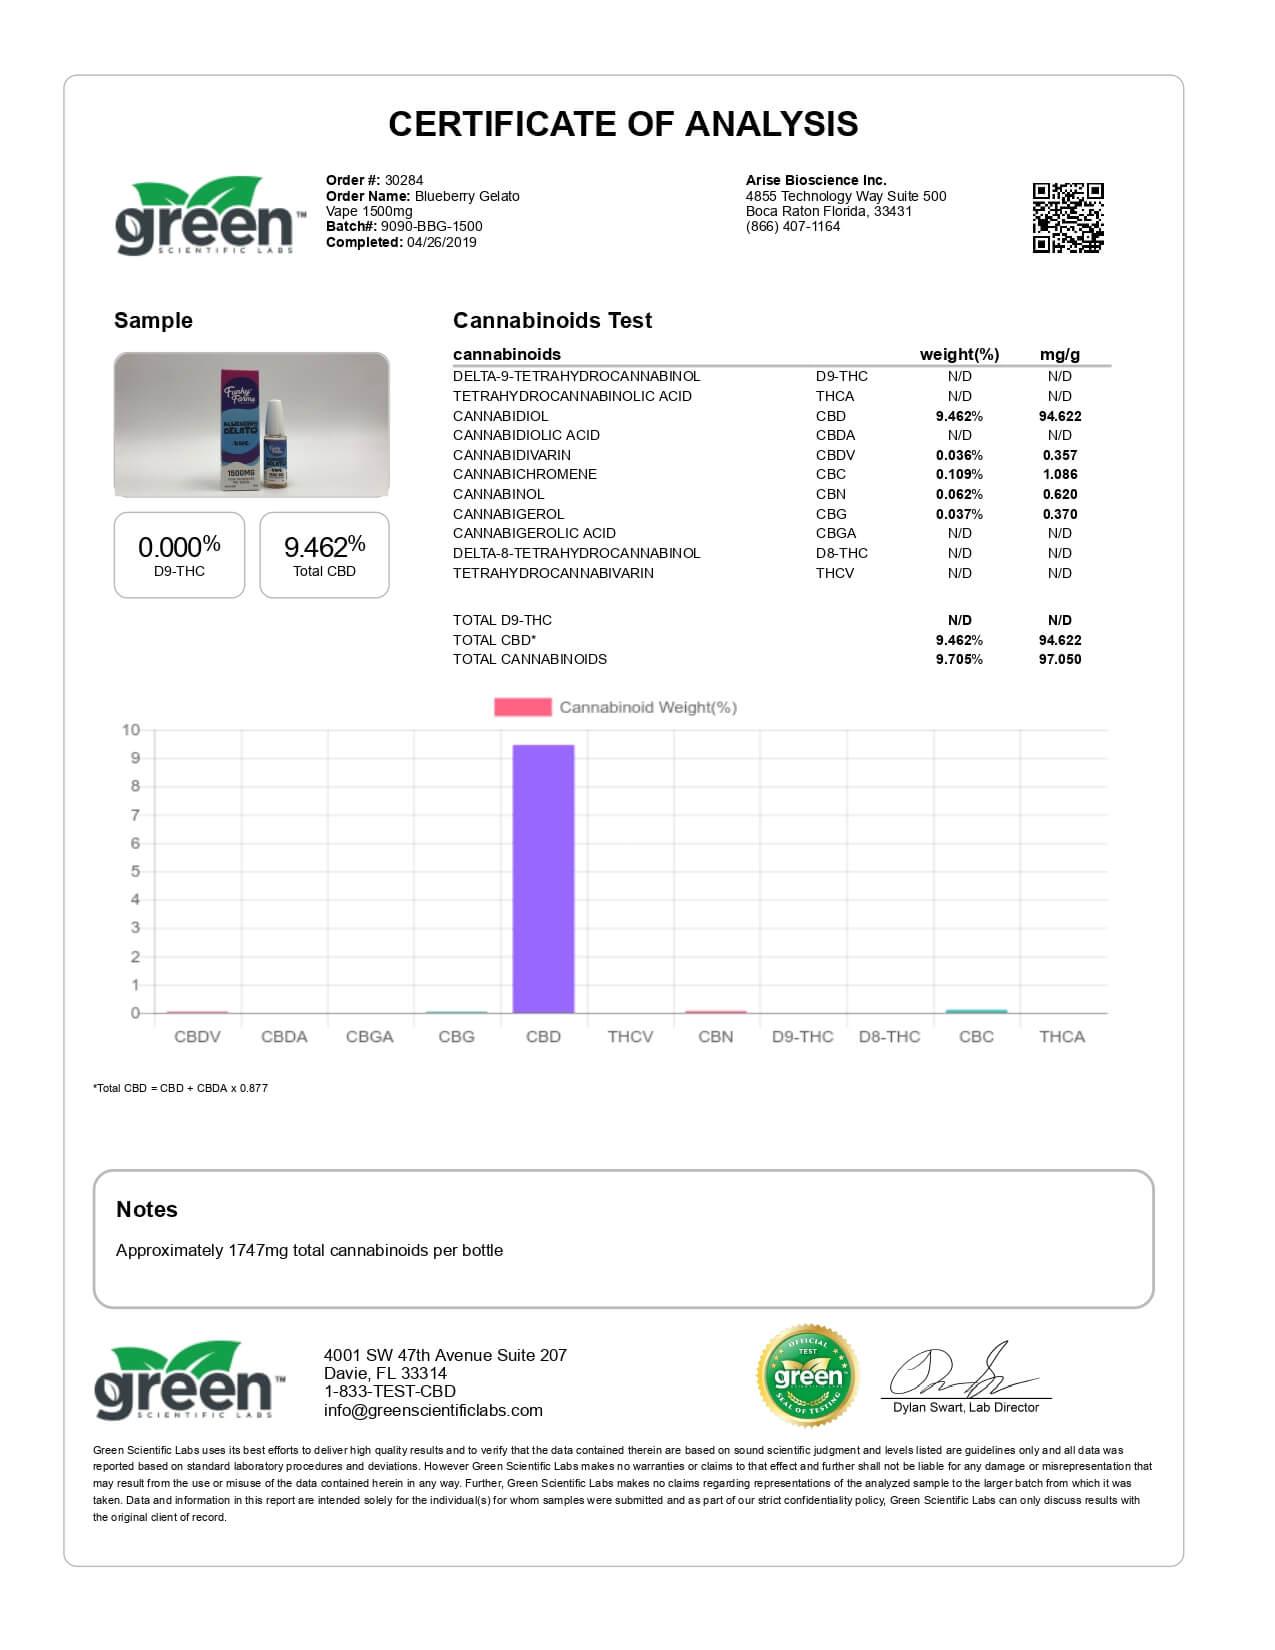 Funky Farms CBD Vape Blueberry Gelato 1500mg Lab Report